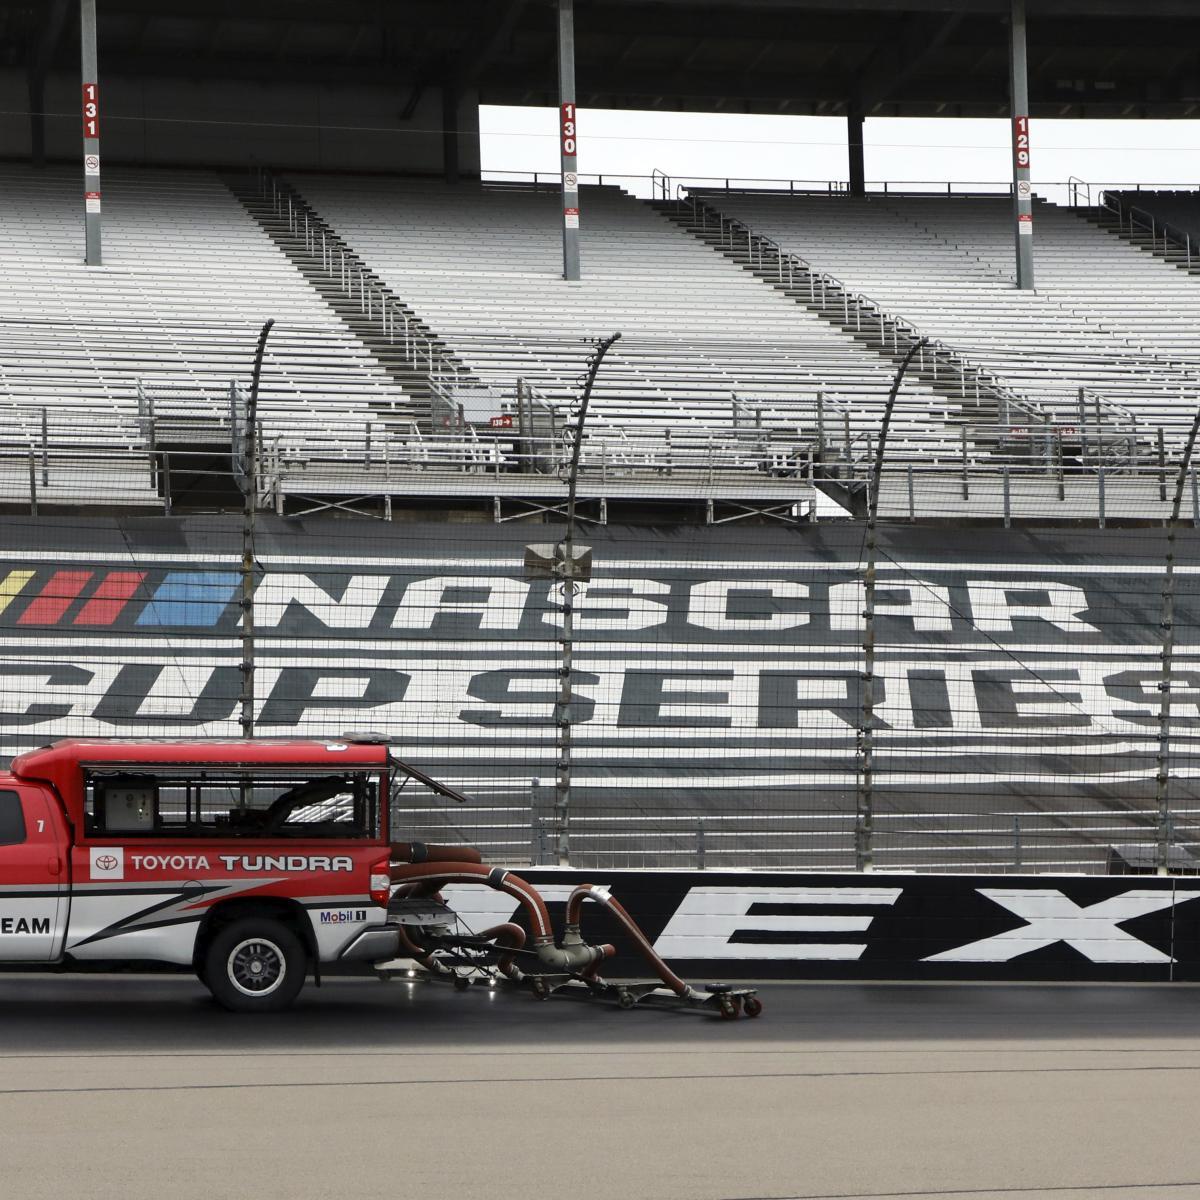 NASCAR Pit Crew Member William Harrell, Wife Blakley Die in Car Crash